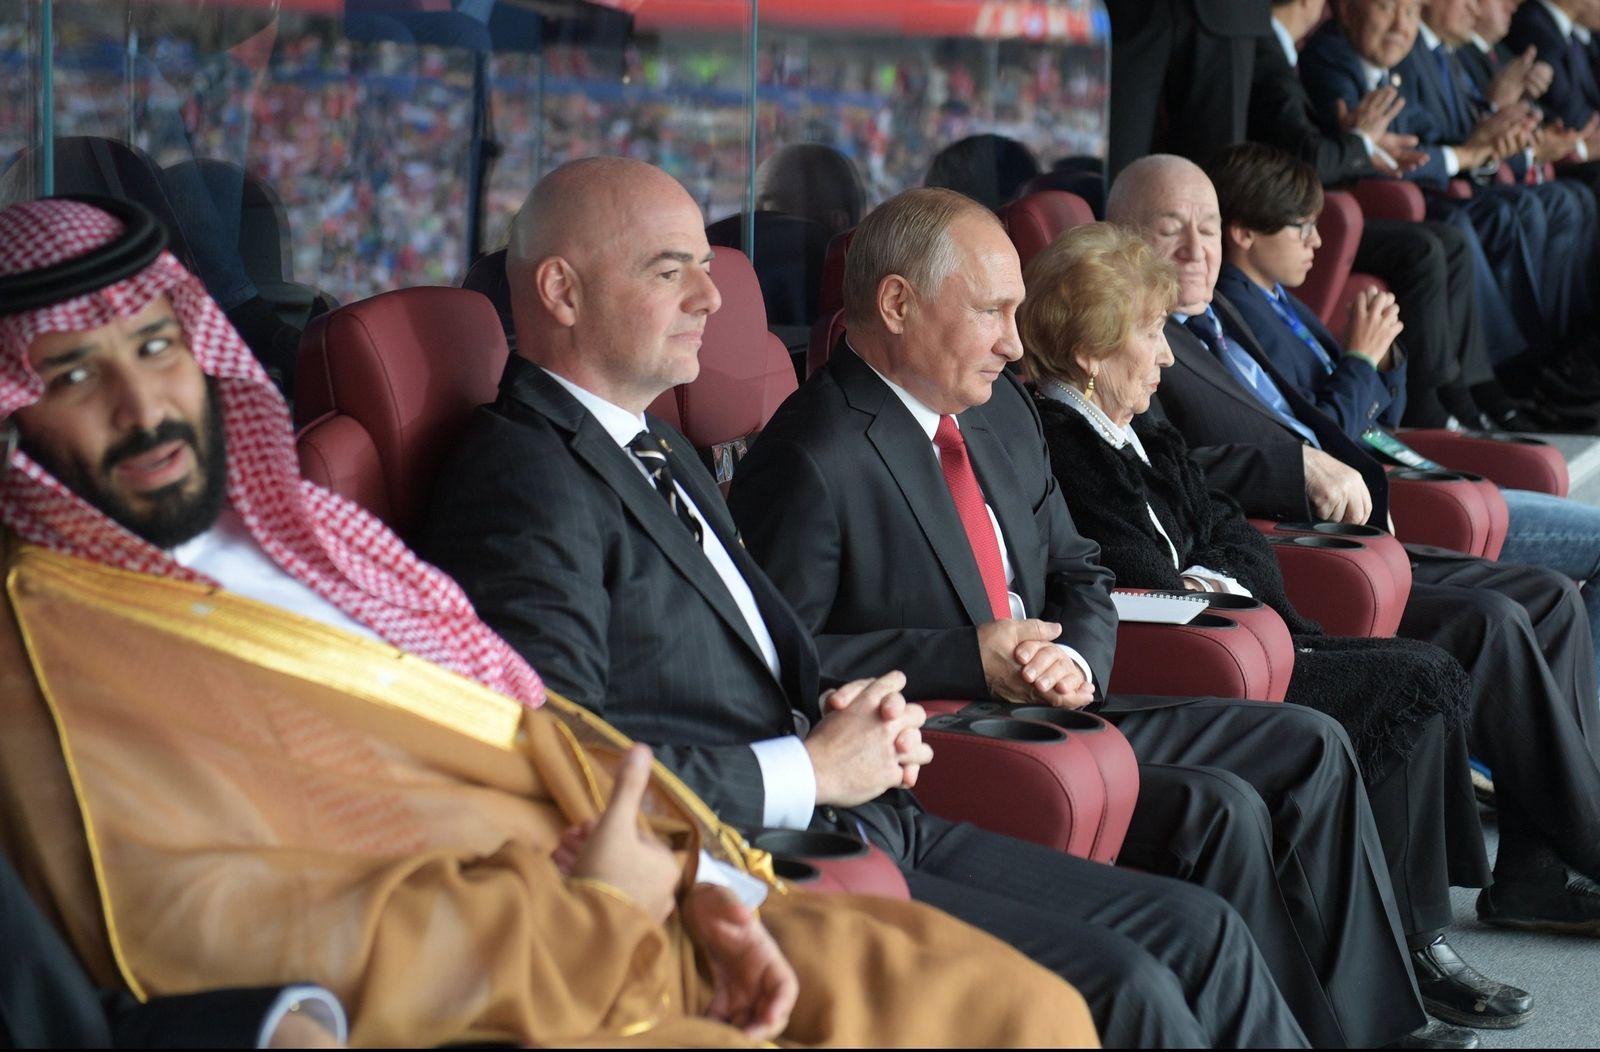 Putin WM/ Putin, Infantino,Mohammed bin Salman